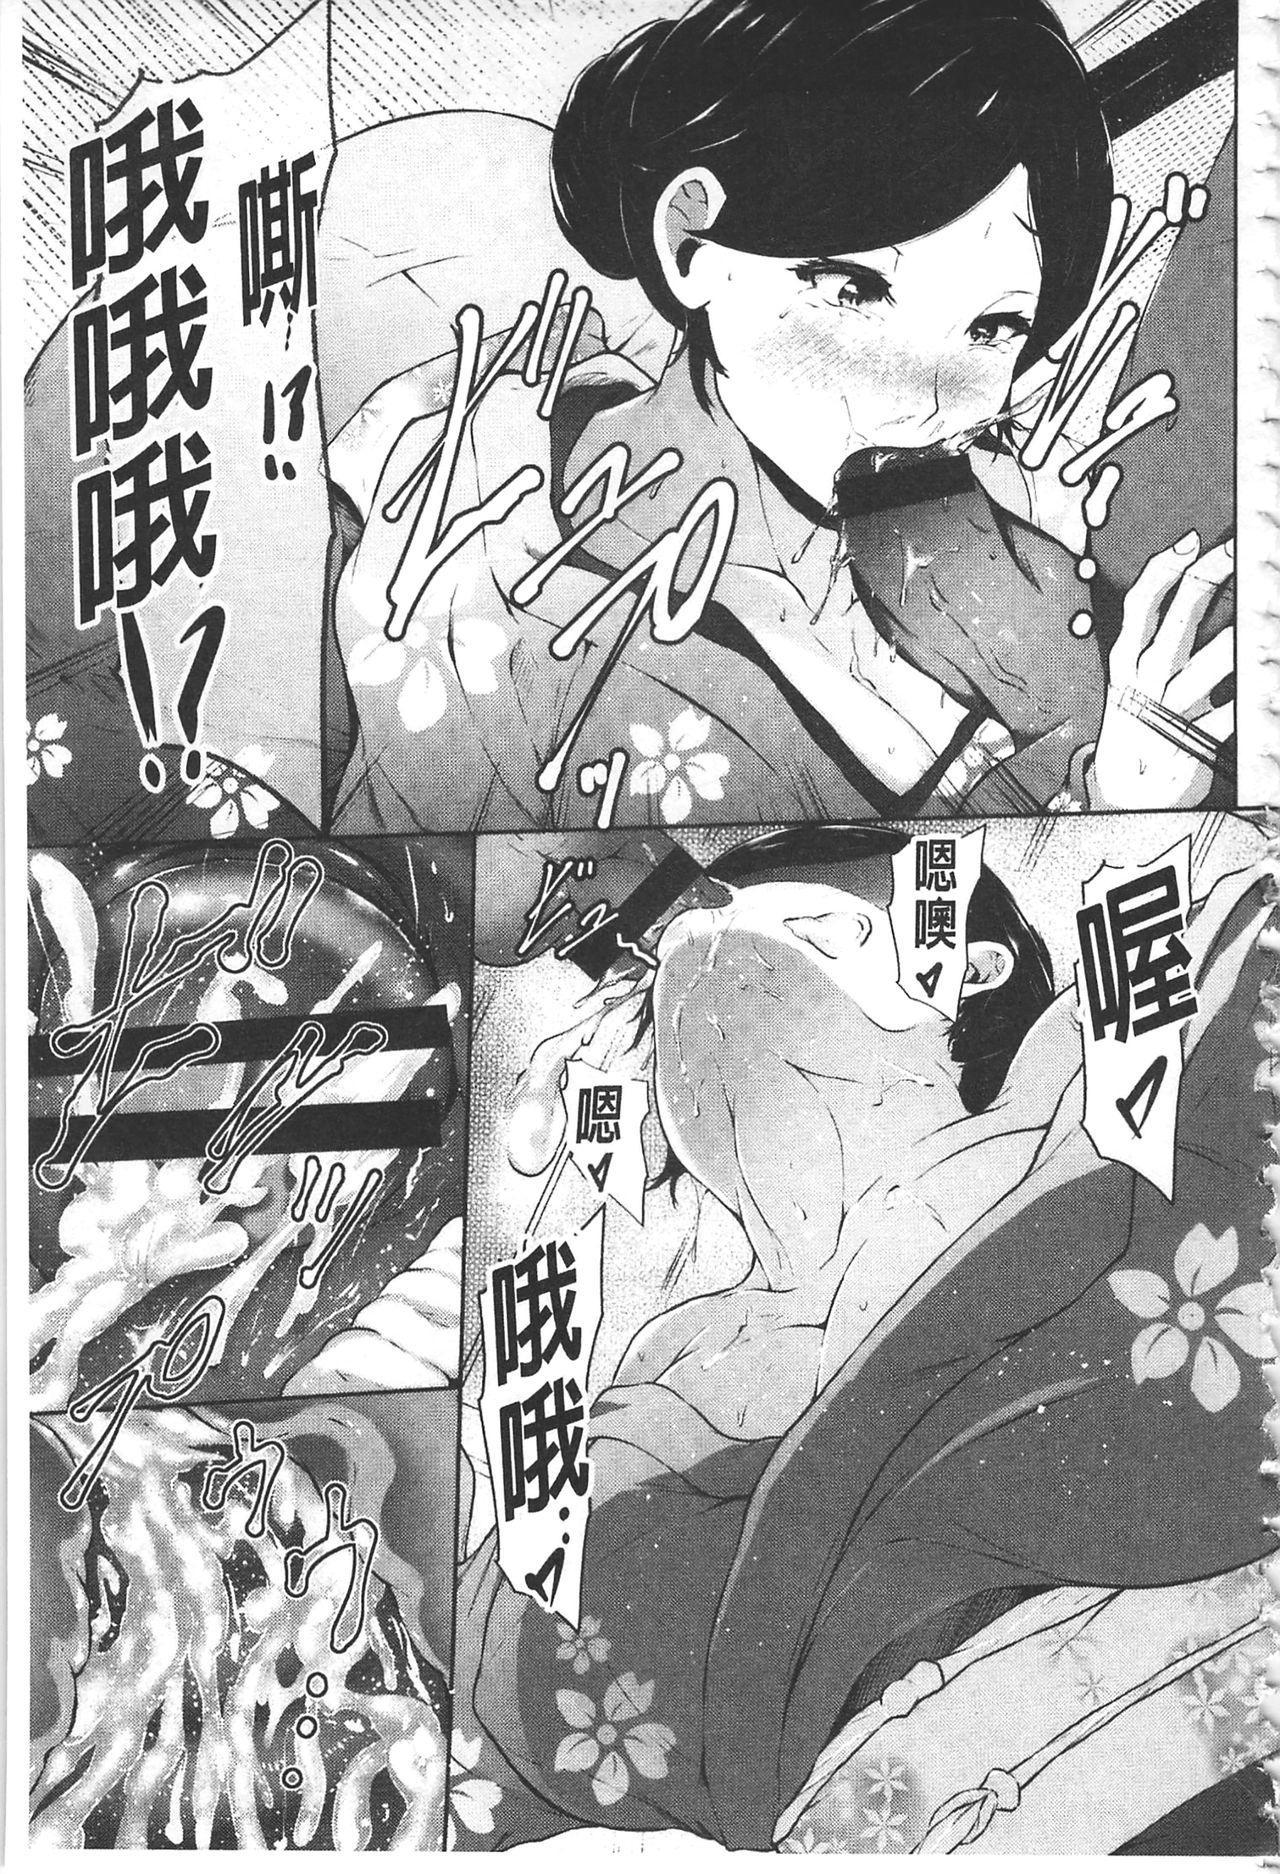 [Lorica] Biinkan Anal ~Kakusei Nejikomi Ana~ | 美淫感猥菊花 塞入擴張覺醒穴 [Chinese] 121